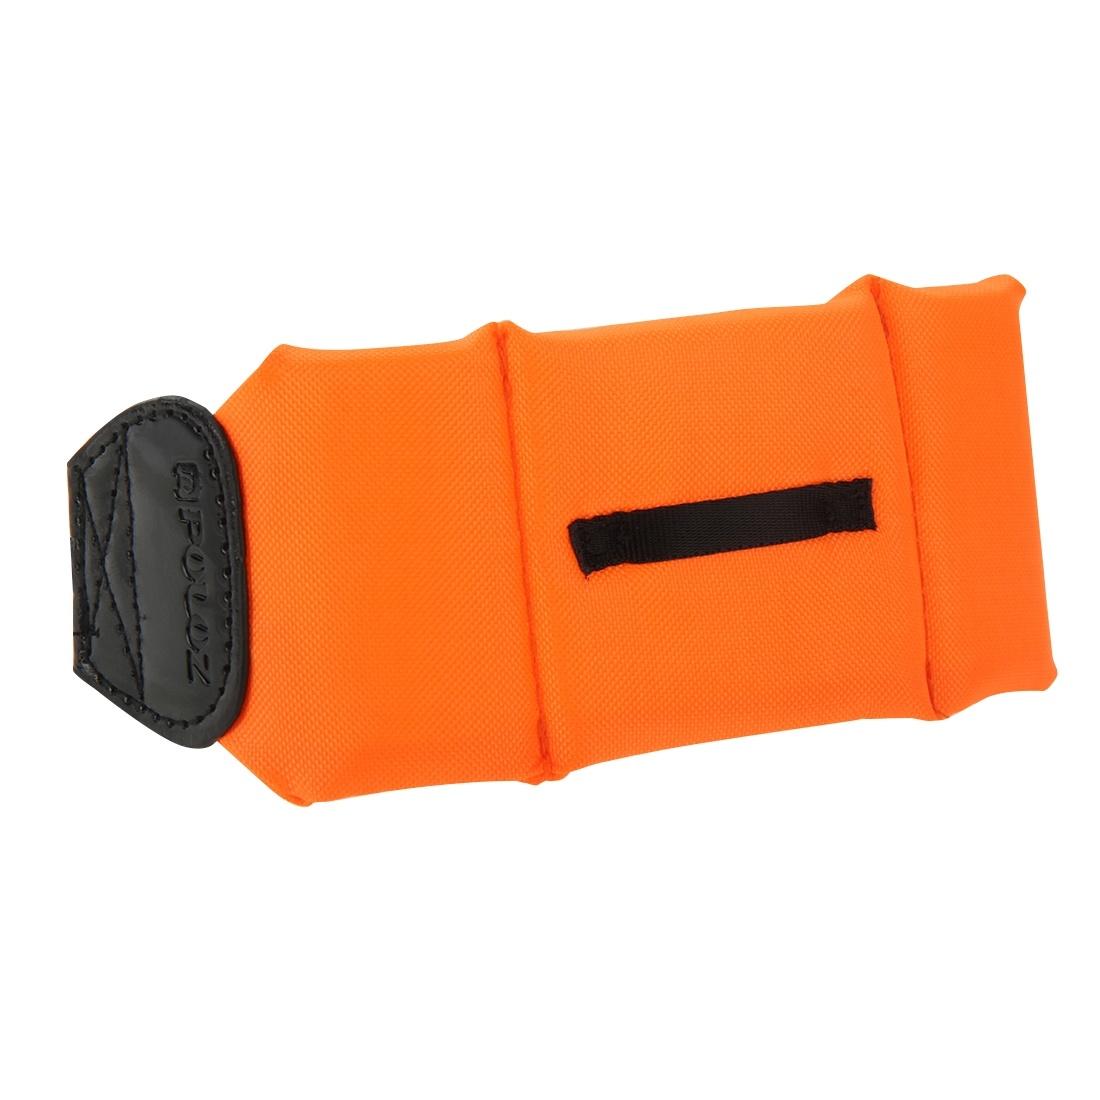 Drijvende Polsband Camera.Drijvende Foam Polsband Floating Wrist Strap Voor Gopro Action Camera S